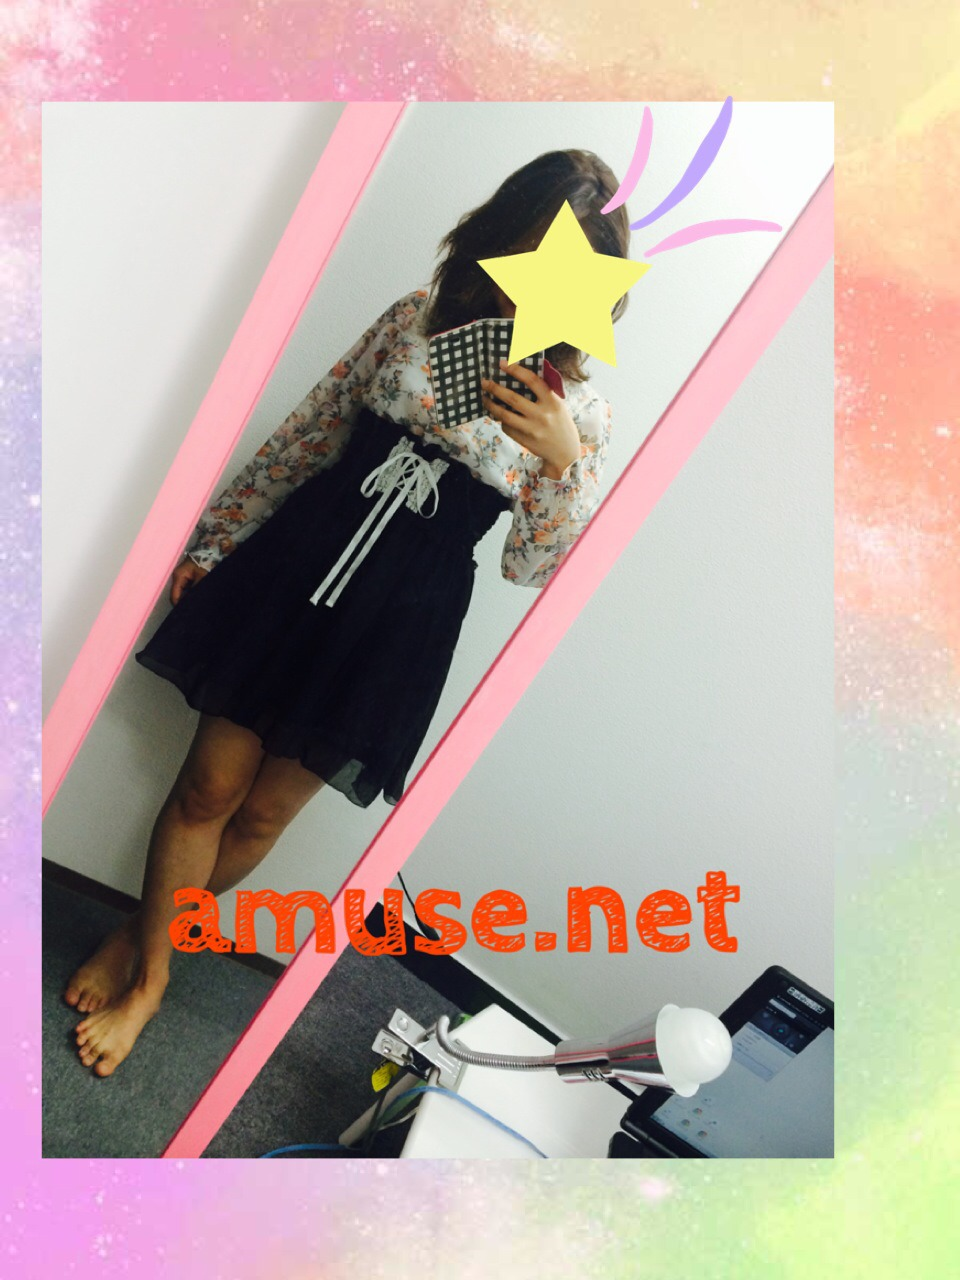 S__13705559.jpg